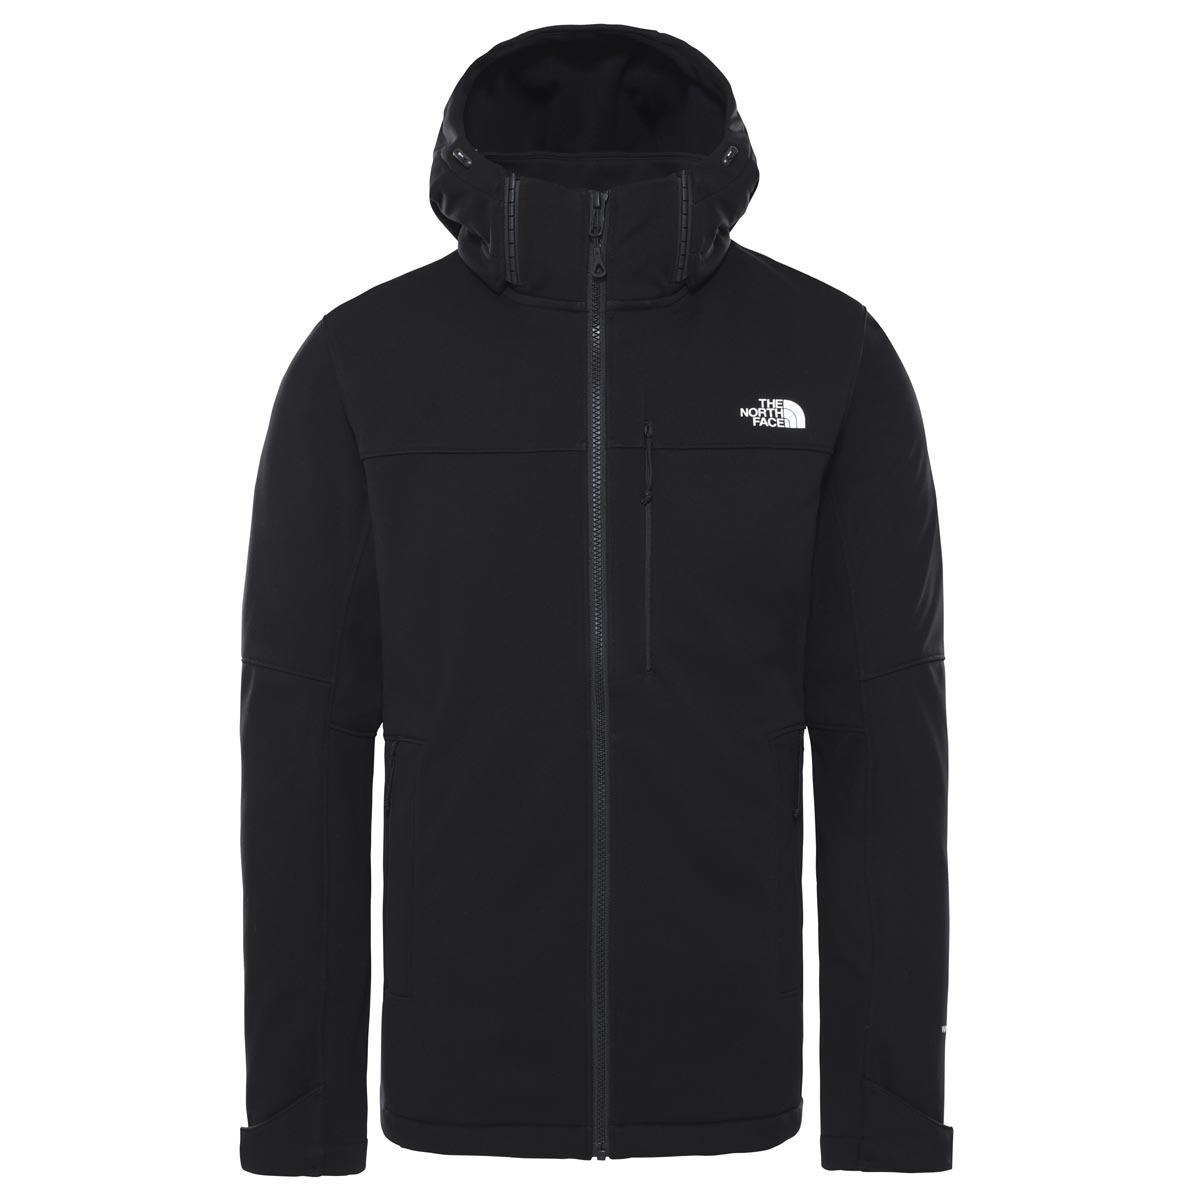 Куртка DIABLO SOFTSHELL DETACHABLE HOOD